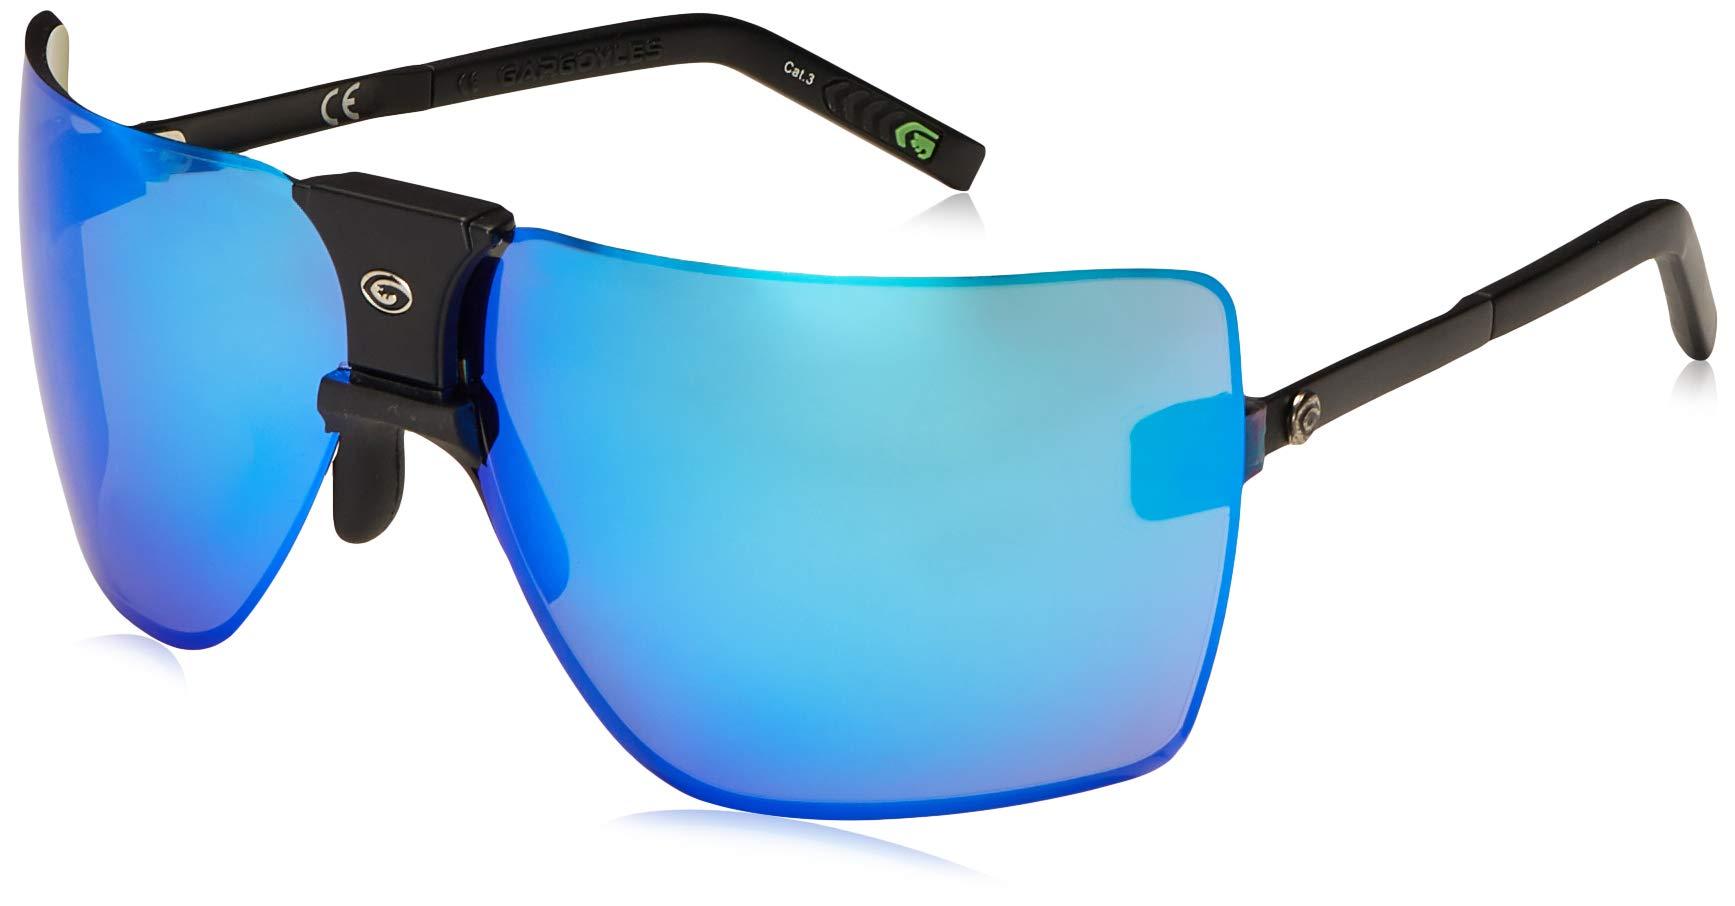 Gargoyles Performance Eyewear Classic Polarized Safety Glasses, Matte Black Frame/Smoke with Blue Mirror Lenses